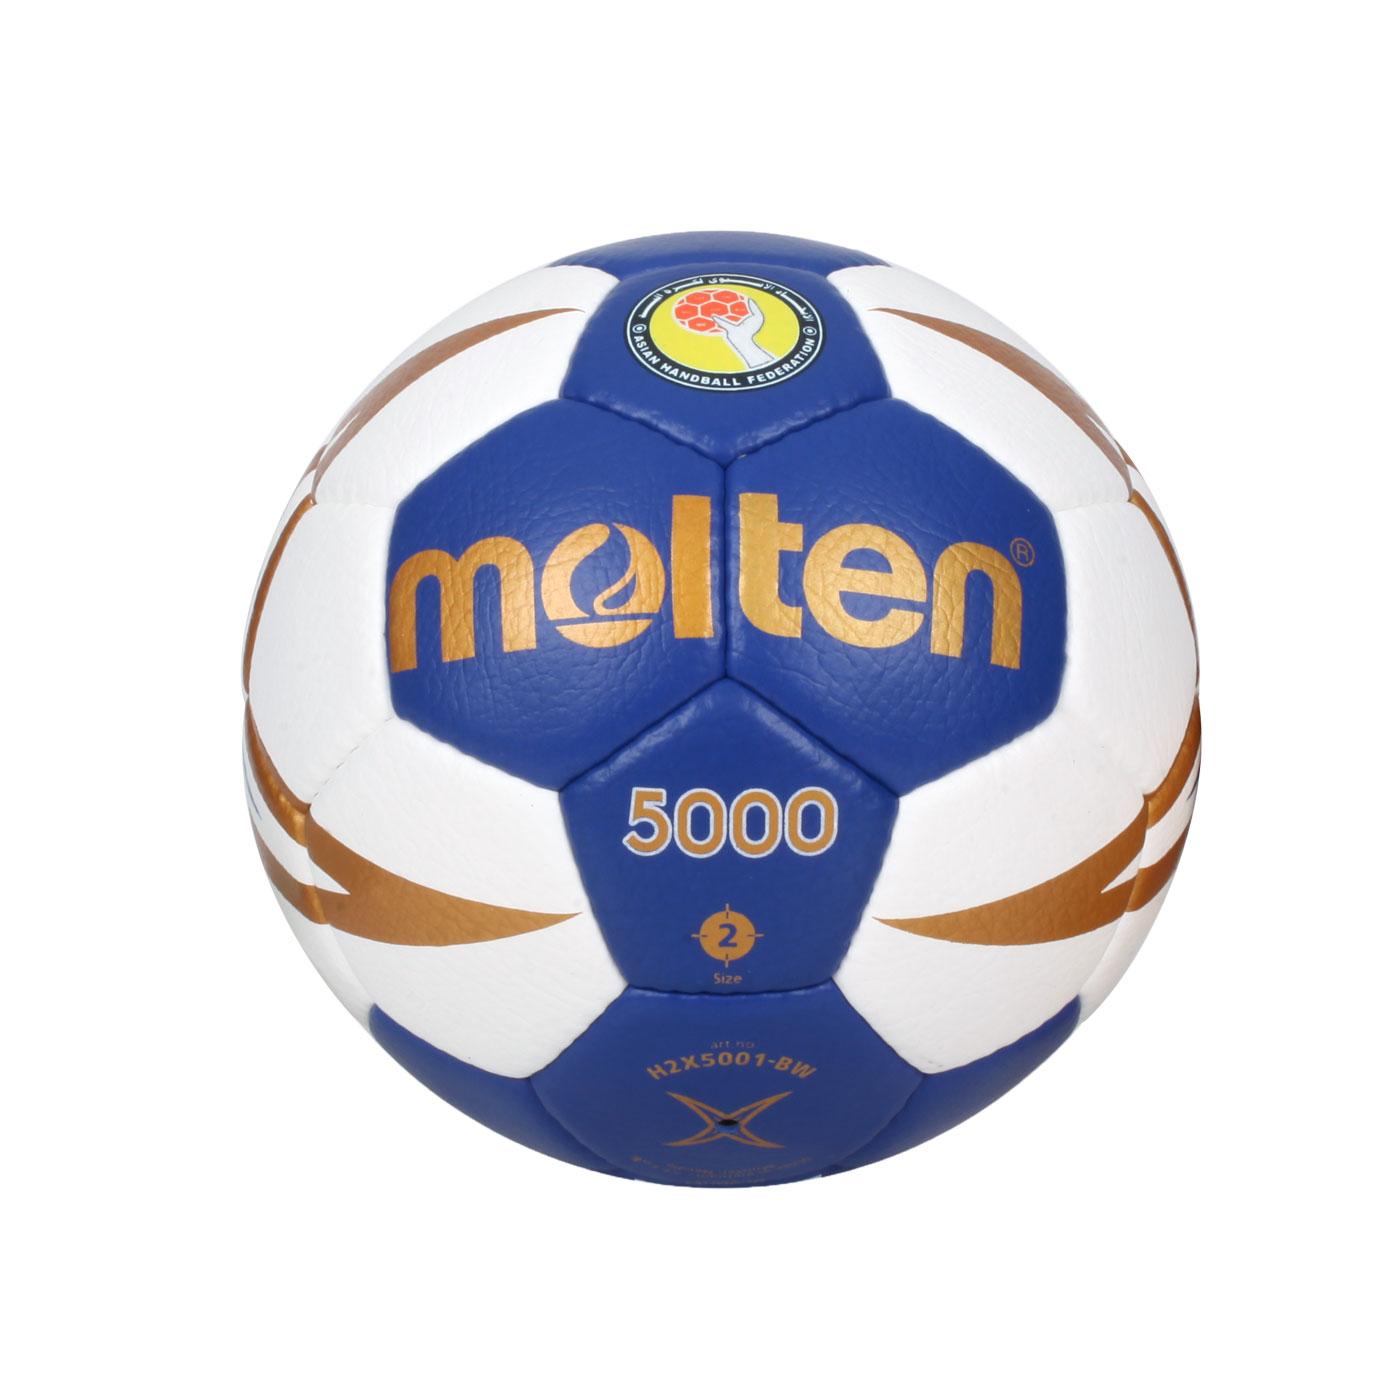 Molten #2合成皮手球 H2X5001-BW - 藍白金